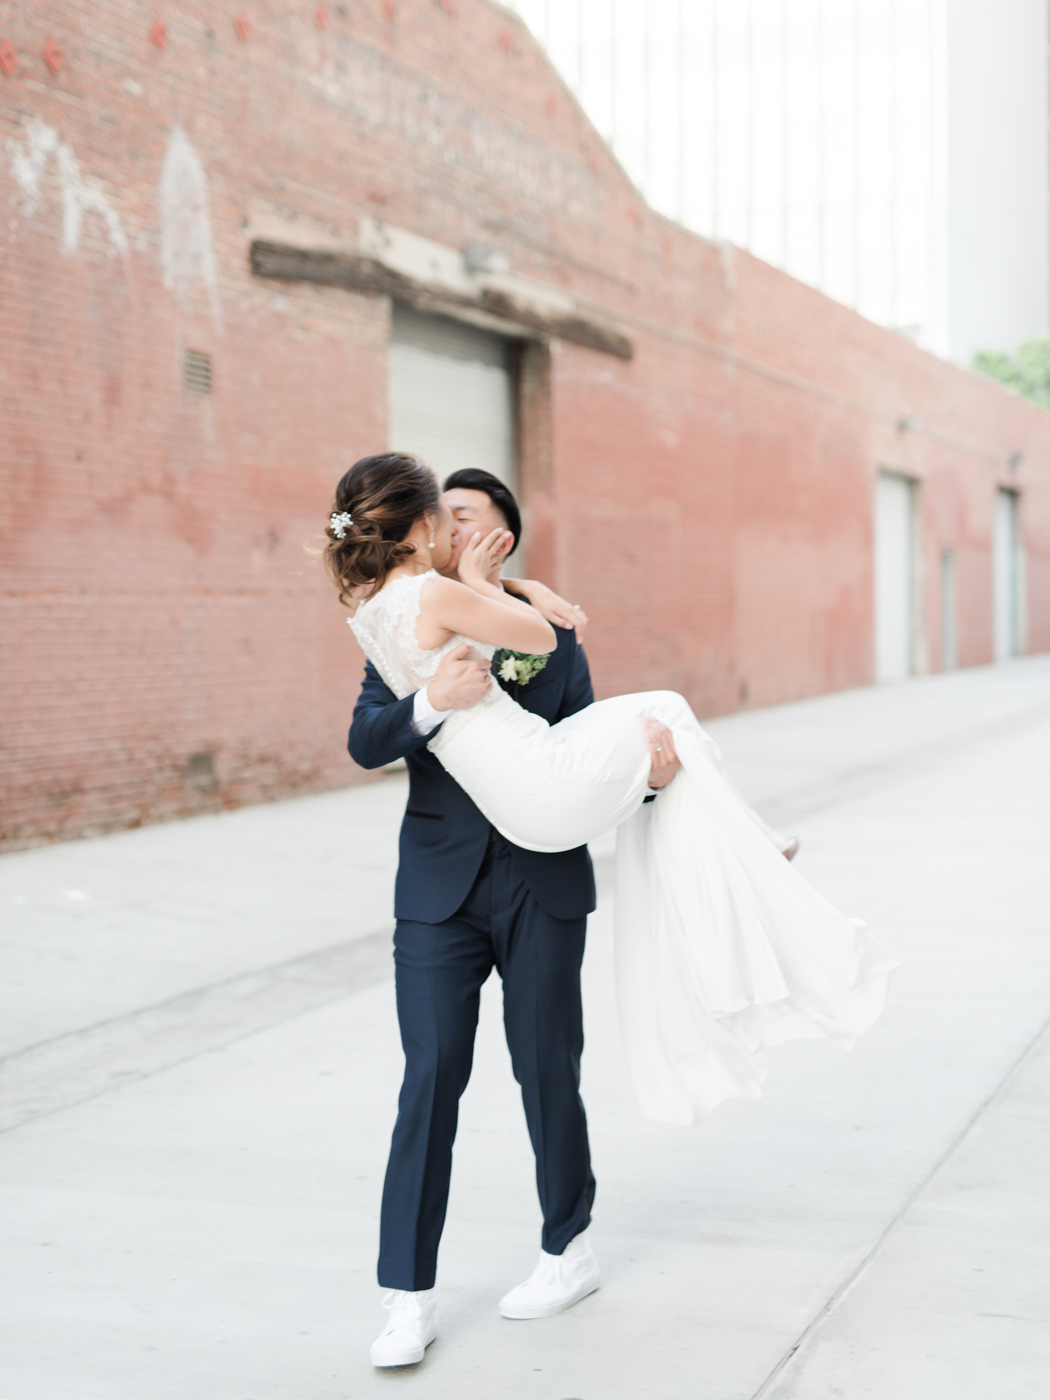 Modern_Wedding_HNYPT_Honeypot_LA_Photographer_Los_Angeles-40.jpg